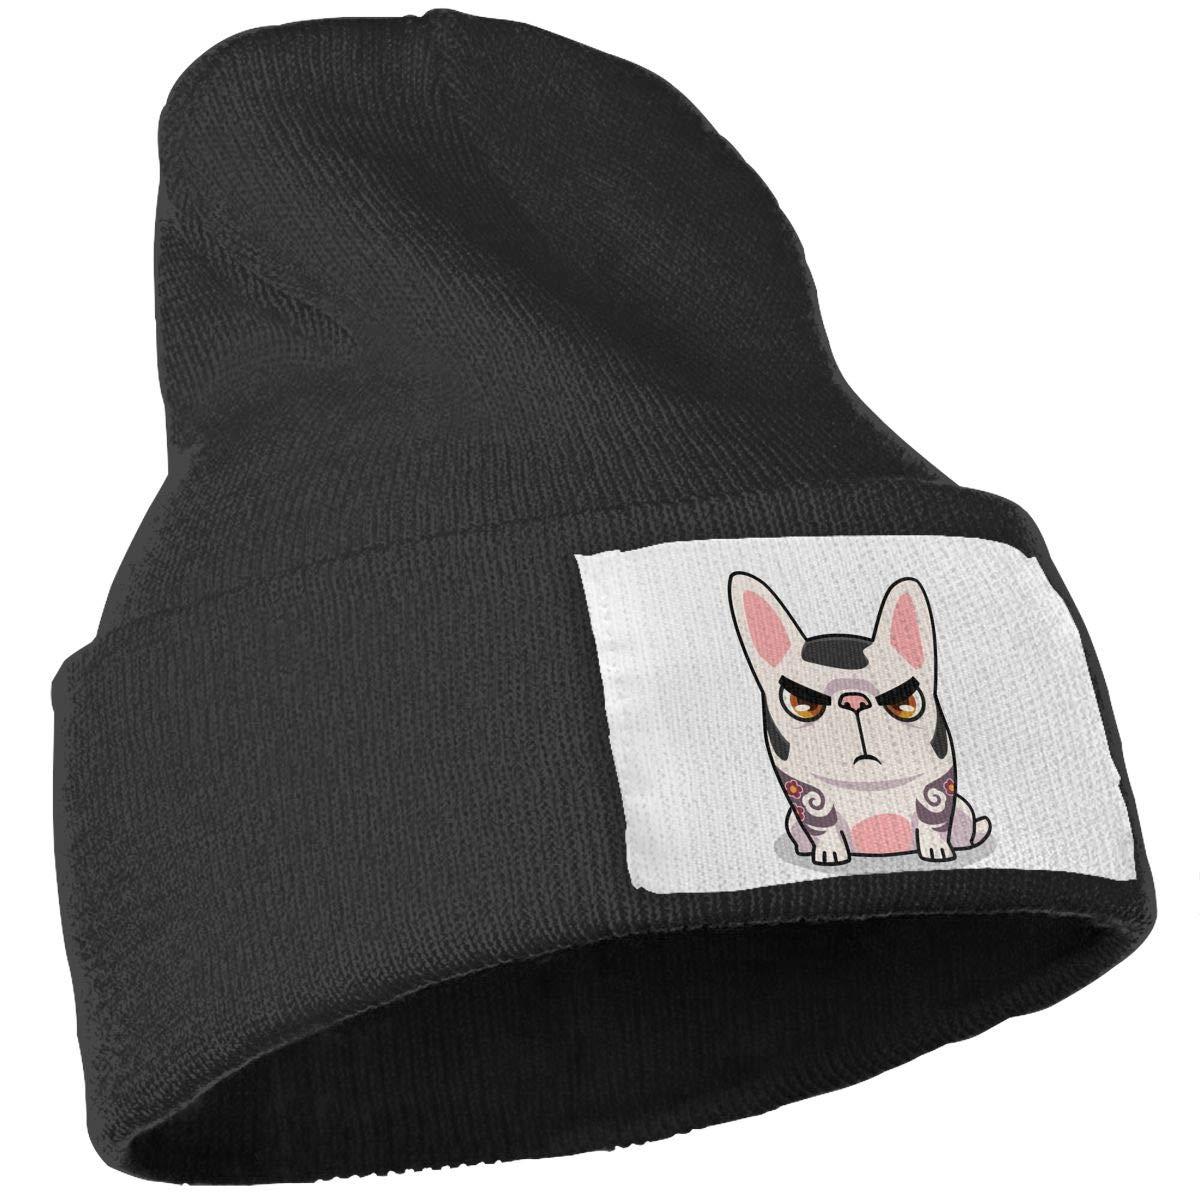 French Bulldog Boss Unisex Fashion Knitted Hat Luxury Hip-Hop Cap